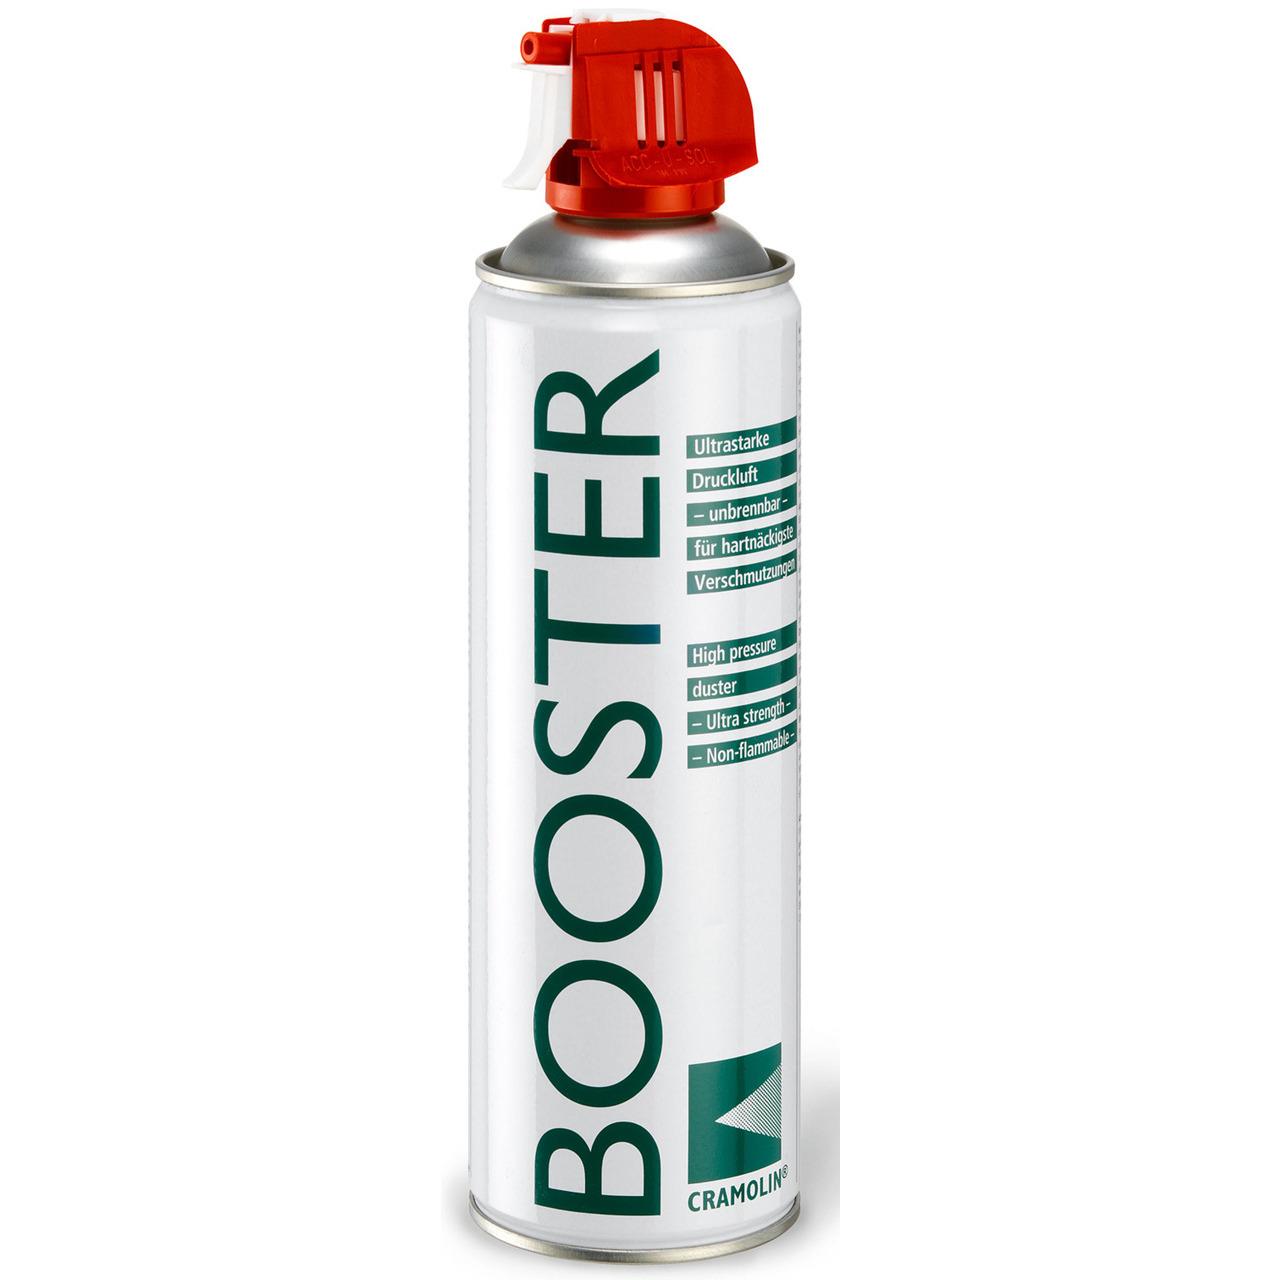 ITW Cramolin Booster Druckluft- 500 g